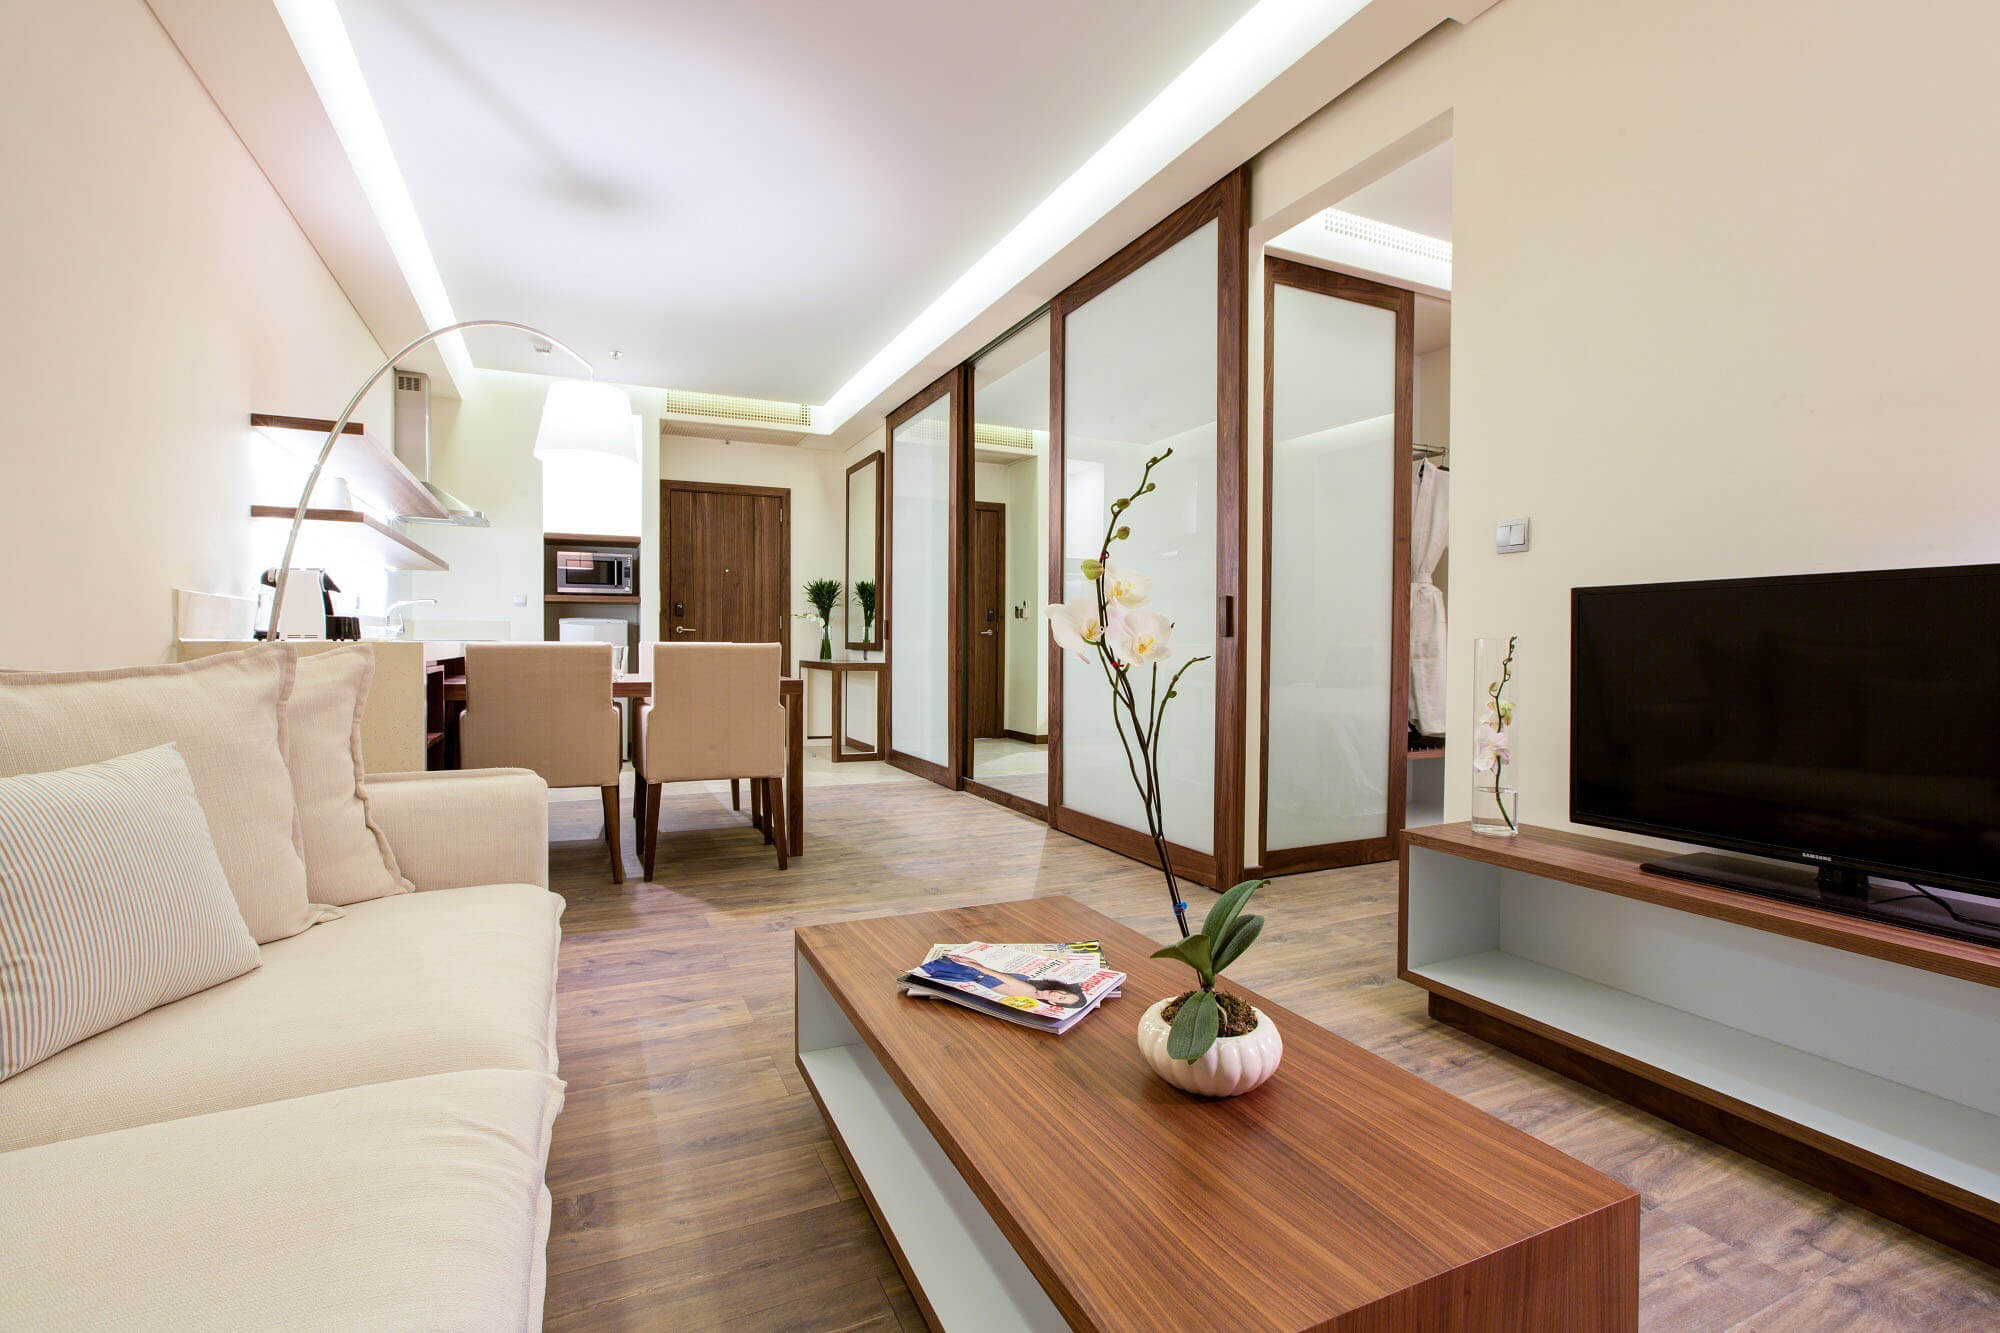 Delight Plus Apartment Apartment A La Carte Danang Beach Hotel 200 Vo Nguyen Giap Danang Fantasticity Com 02